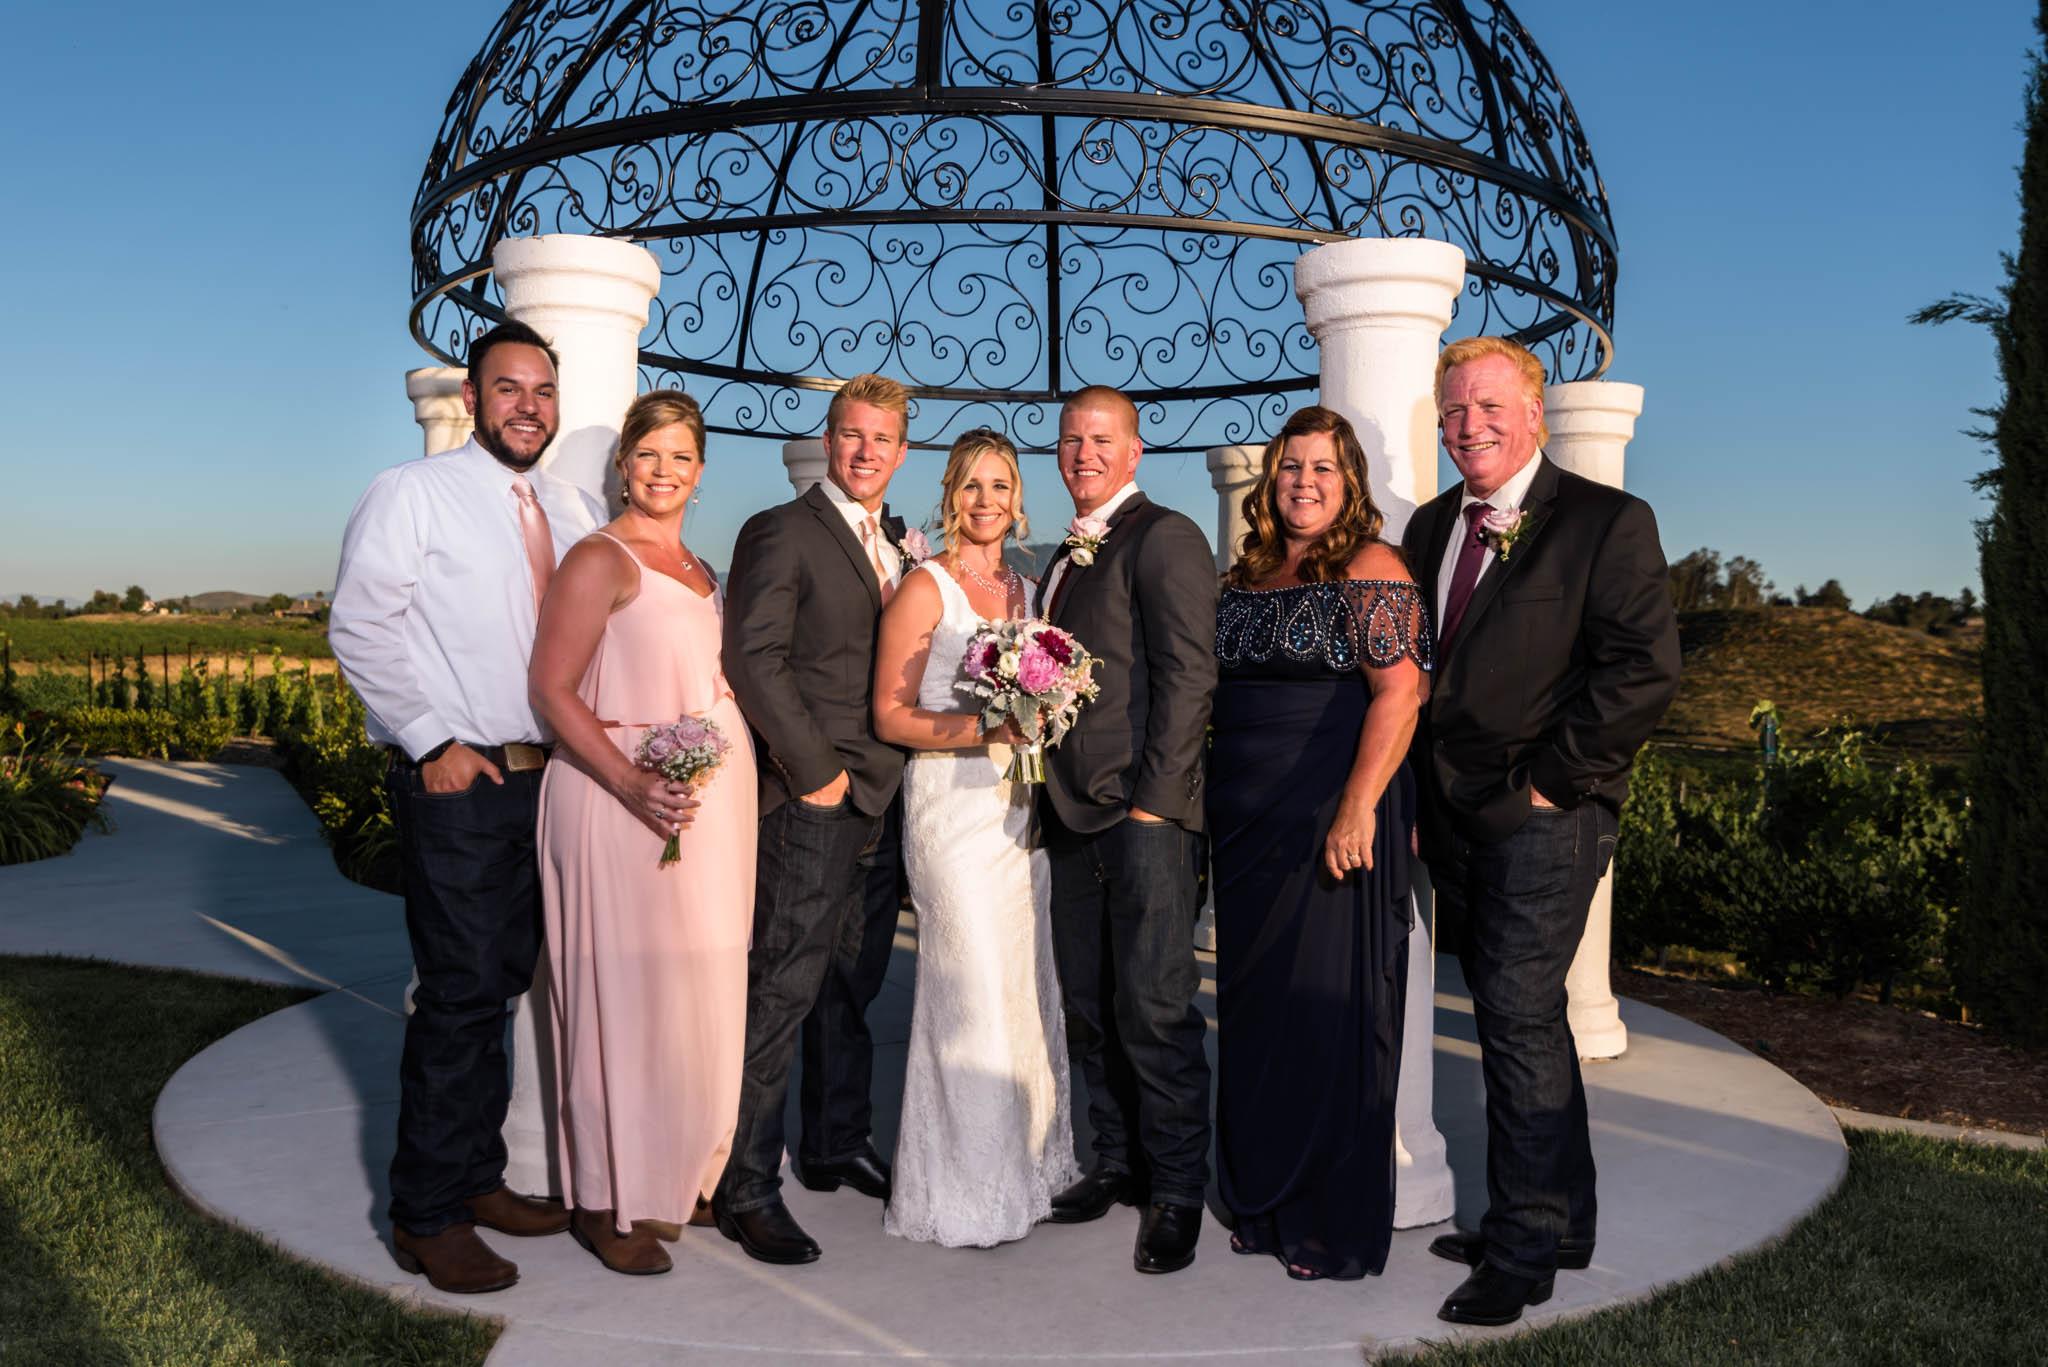 Avensole-Winery-Temecula-Wedding-Josh-and-Olivia-3709.JPG